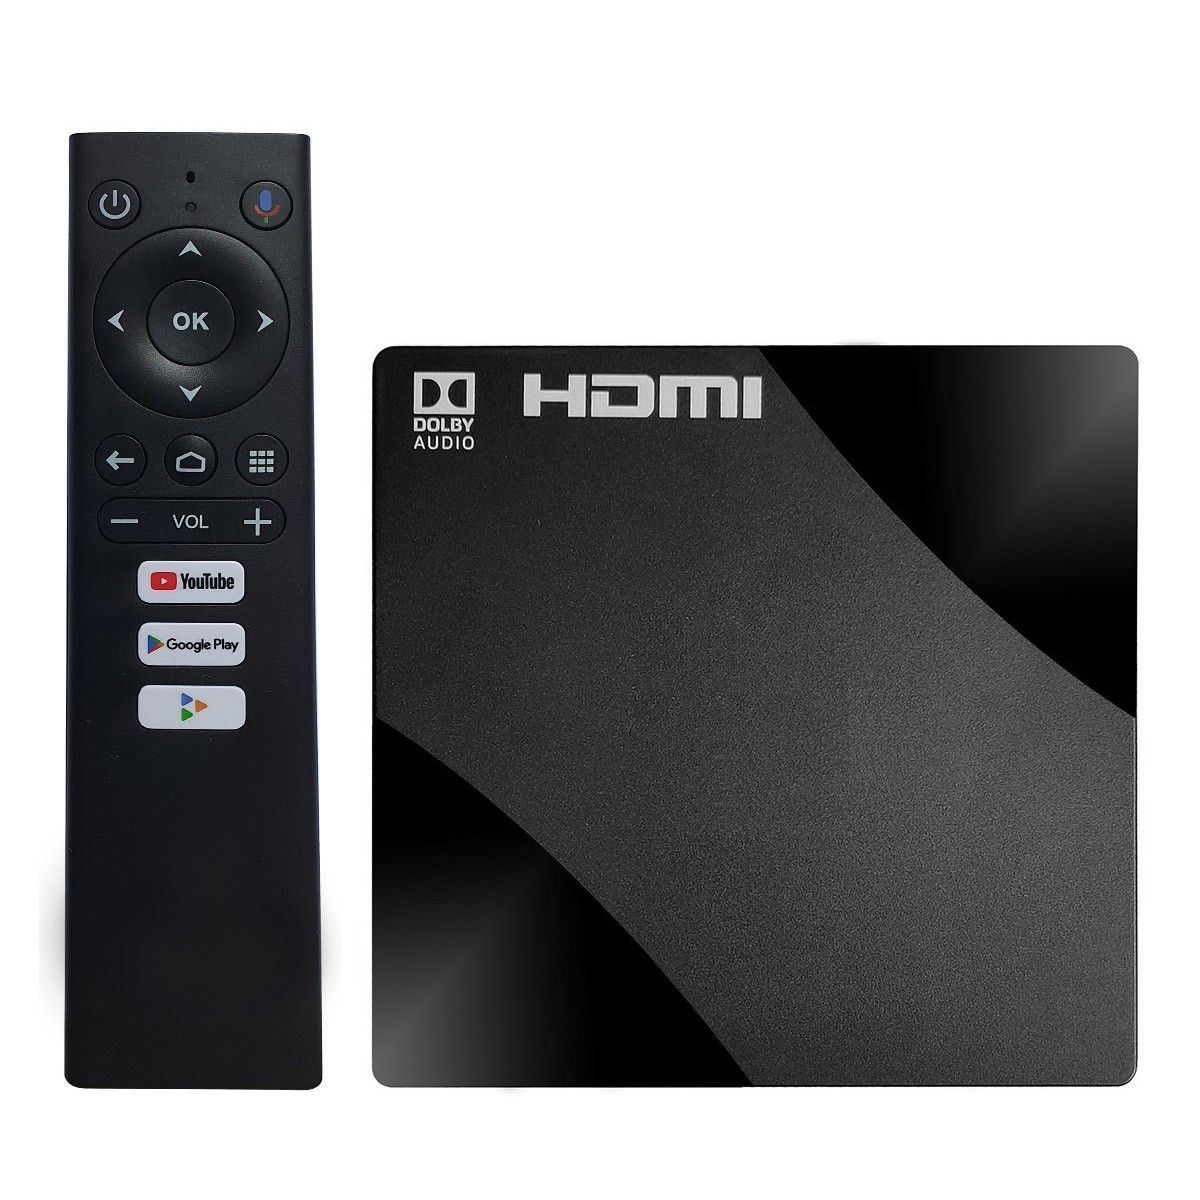 CONVERSOR SmartTV BOX STREAMING 4K ANDROID 8GB 2GB RAM